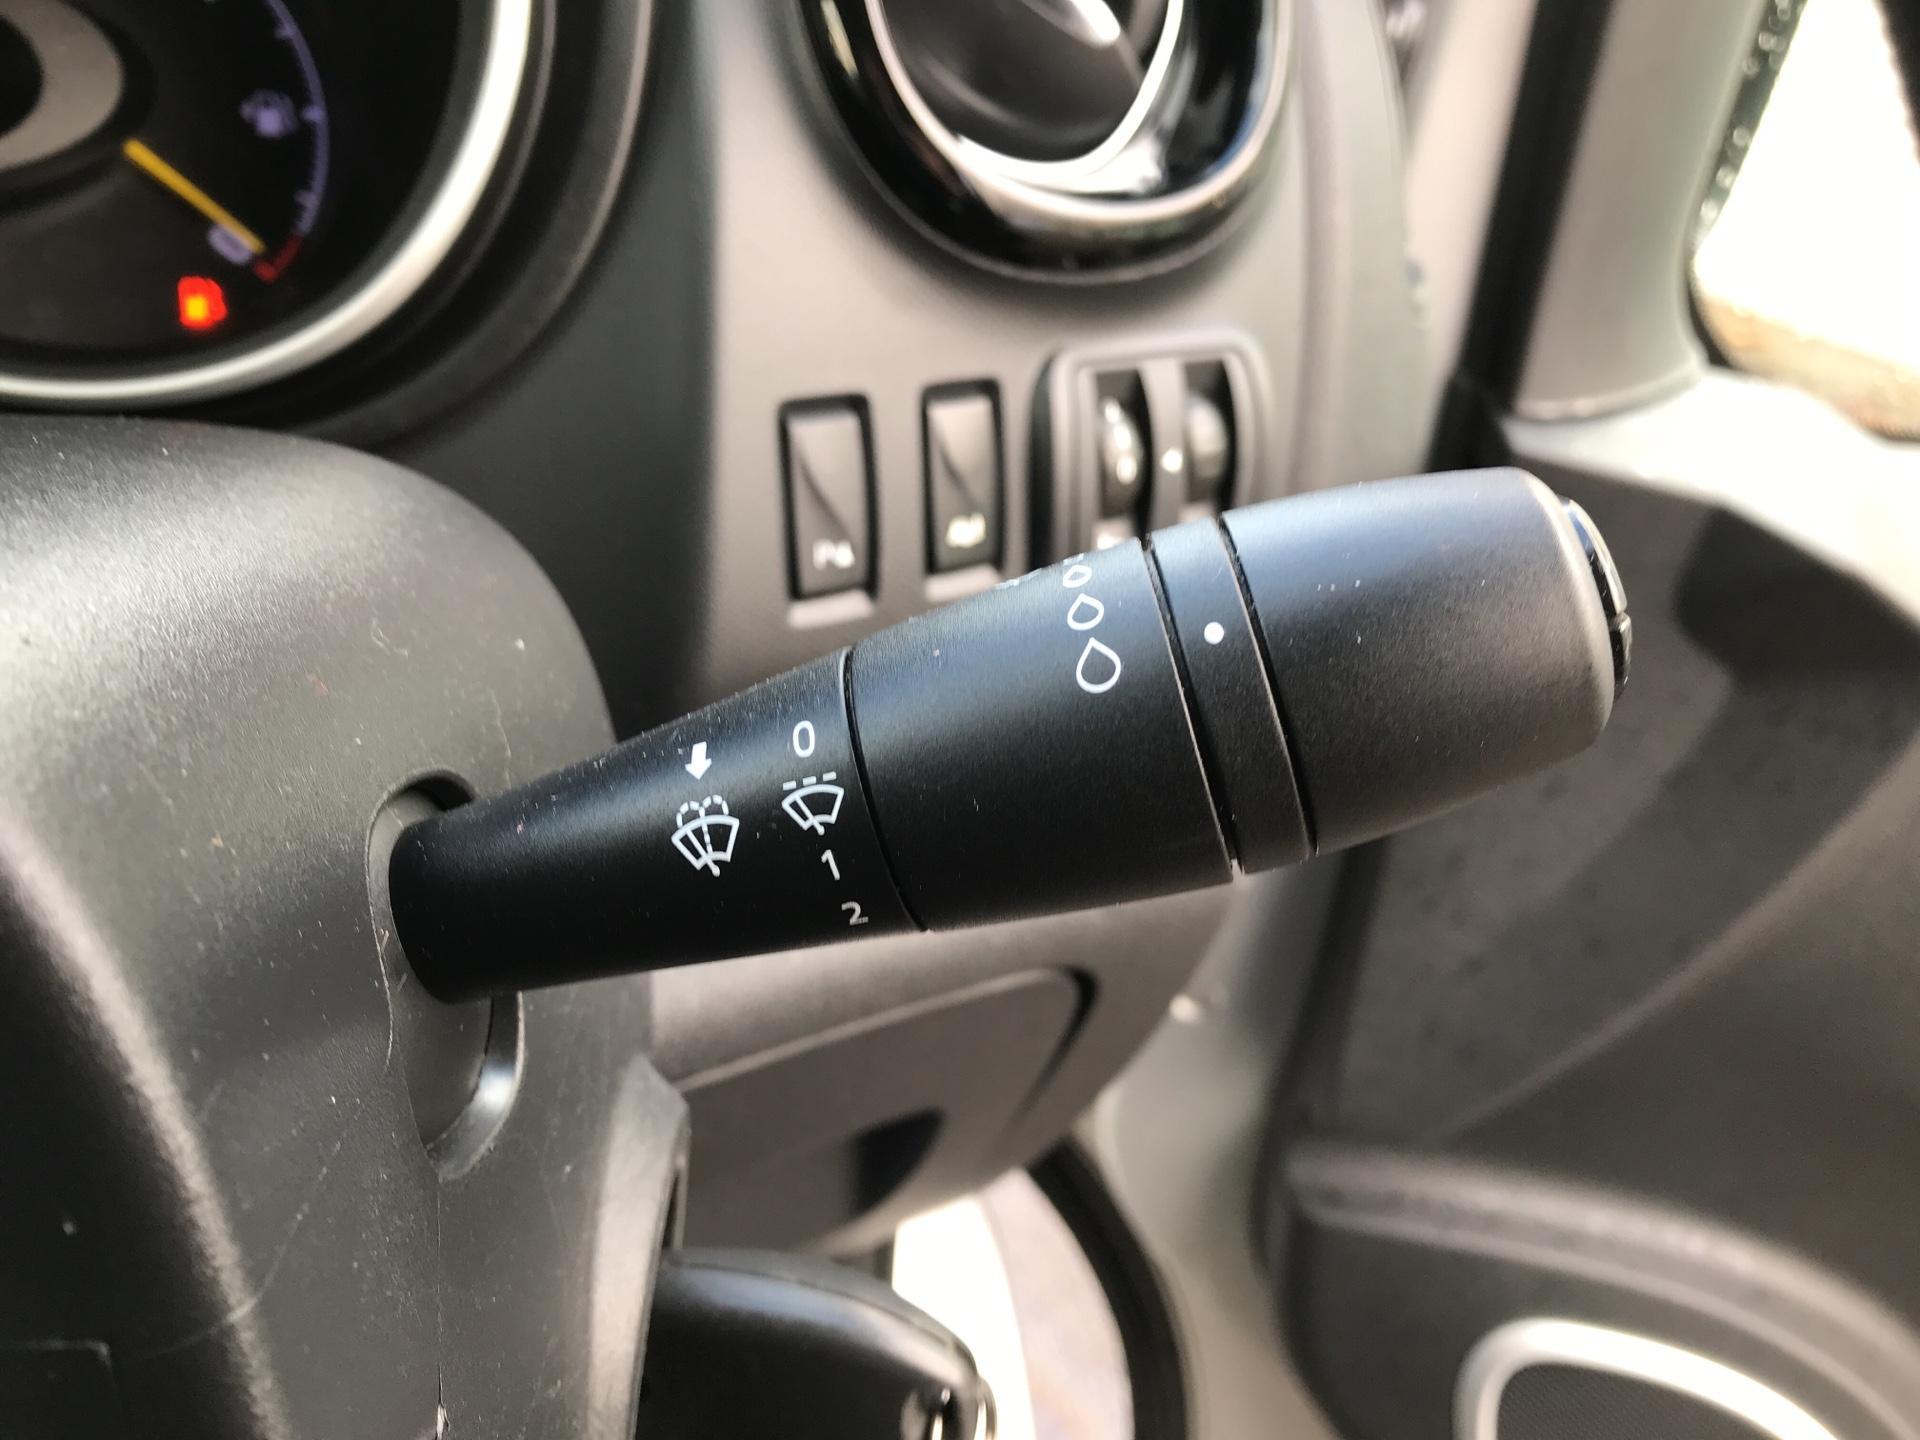 2015 Vauxhall Vivaro L1 H1 2700 1.6 BITURBO 120PS ECOFLEX SPORTIVE EURO 5 (DP15LGO) Image 19